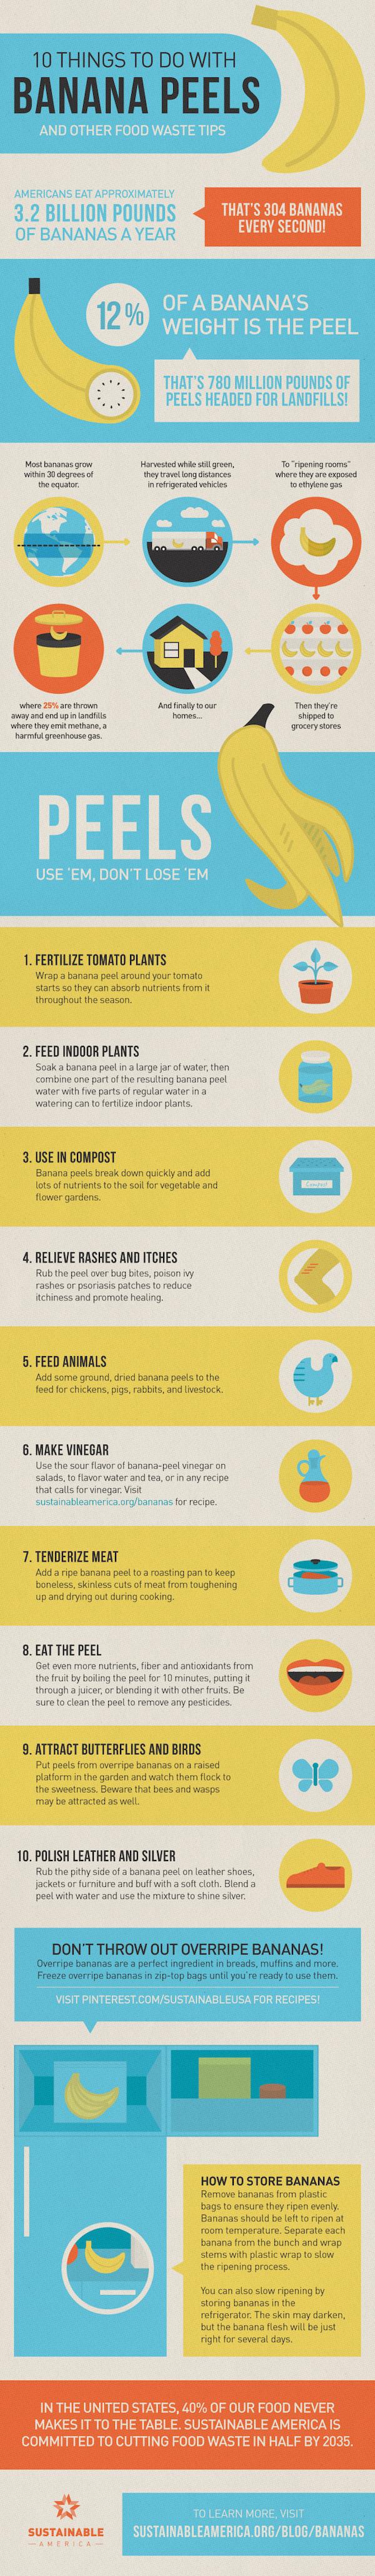 10+ Ways to Reuse Banana Peels